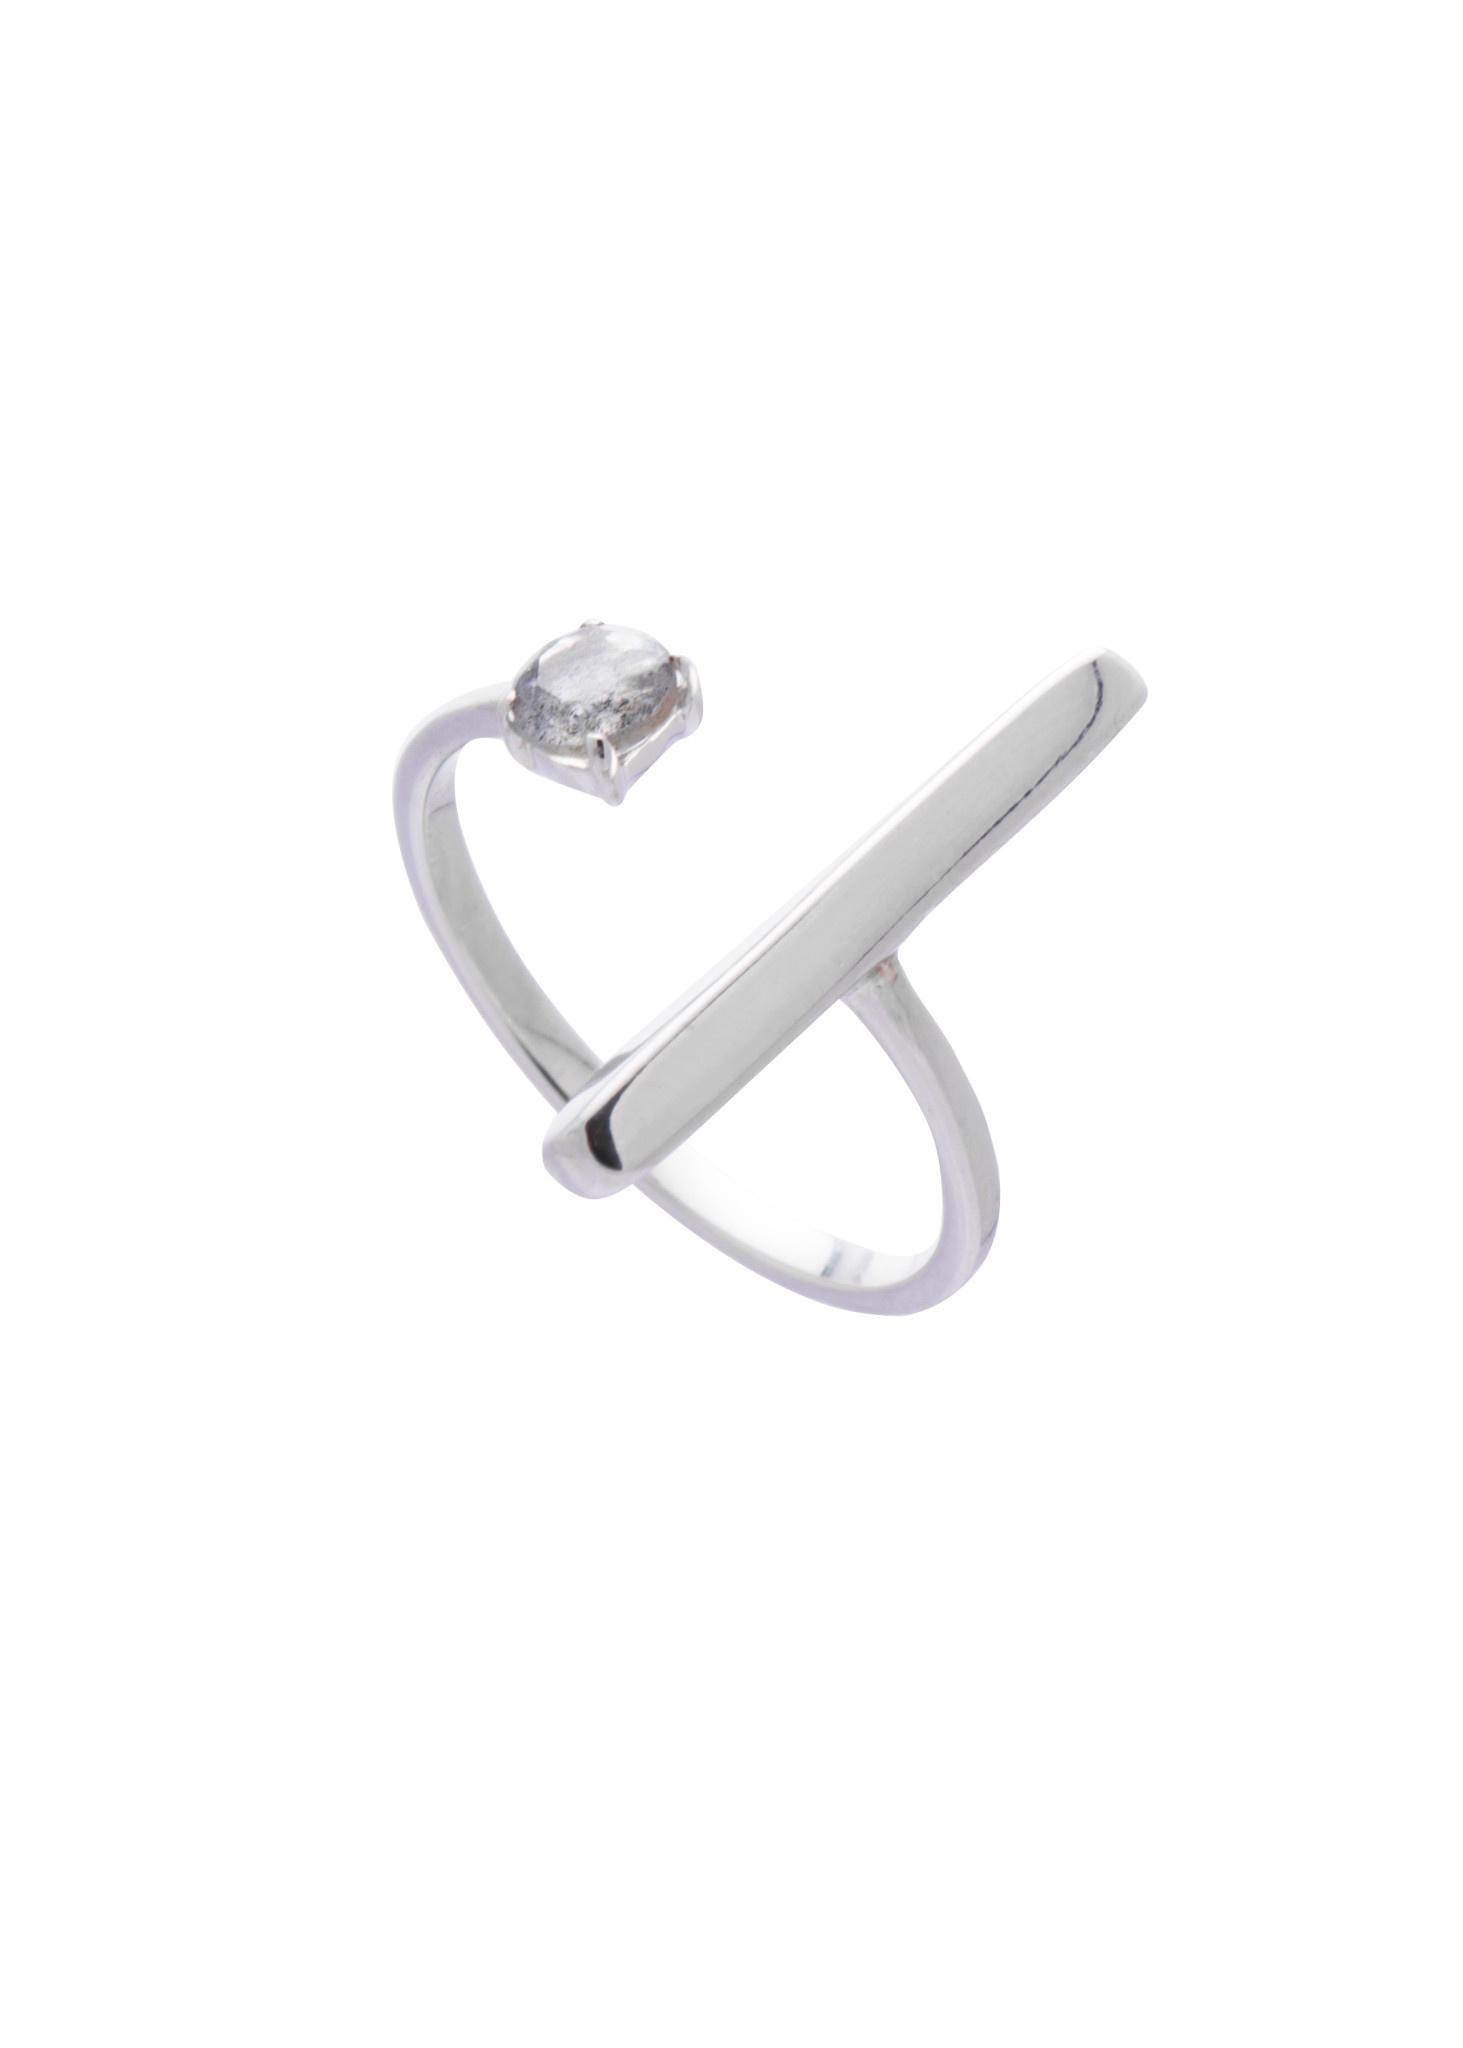 Sarah Mulder Jewelry Sarah Mulder Jewelry - Tali Ring Moonstone